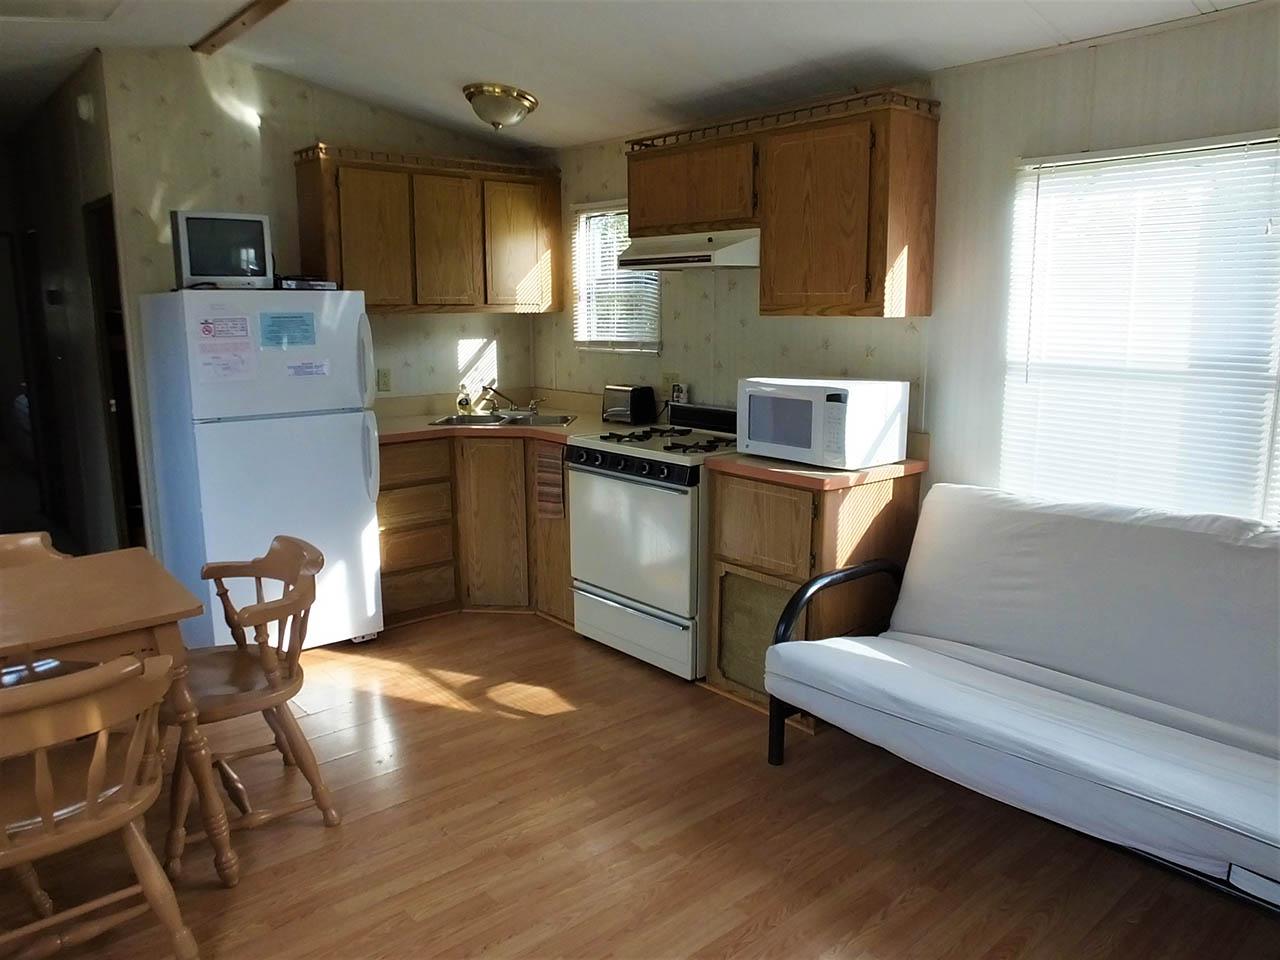 kitchen in park model trailer